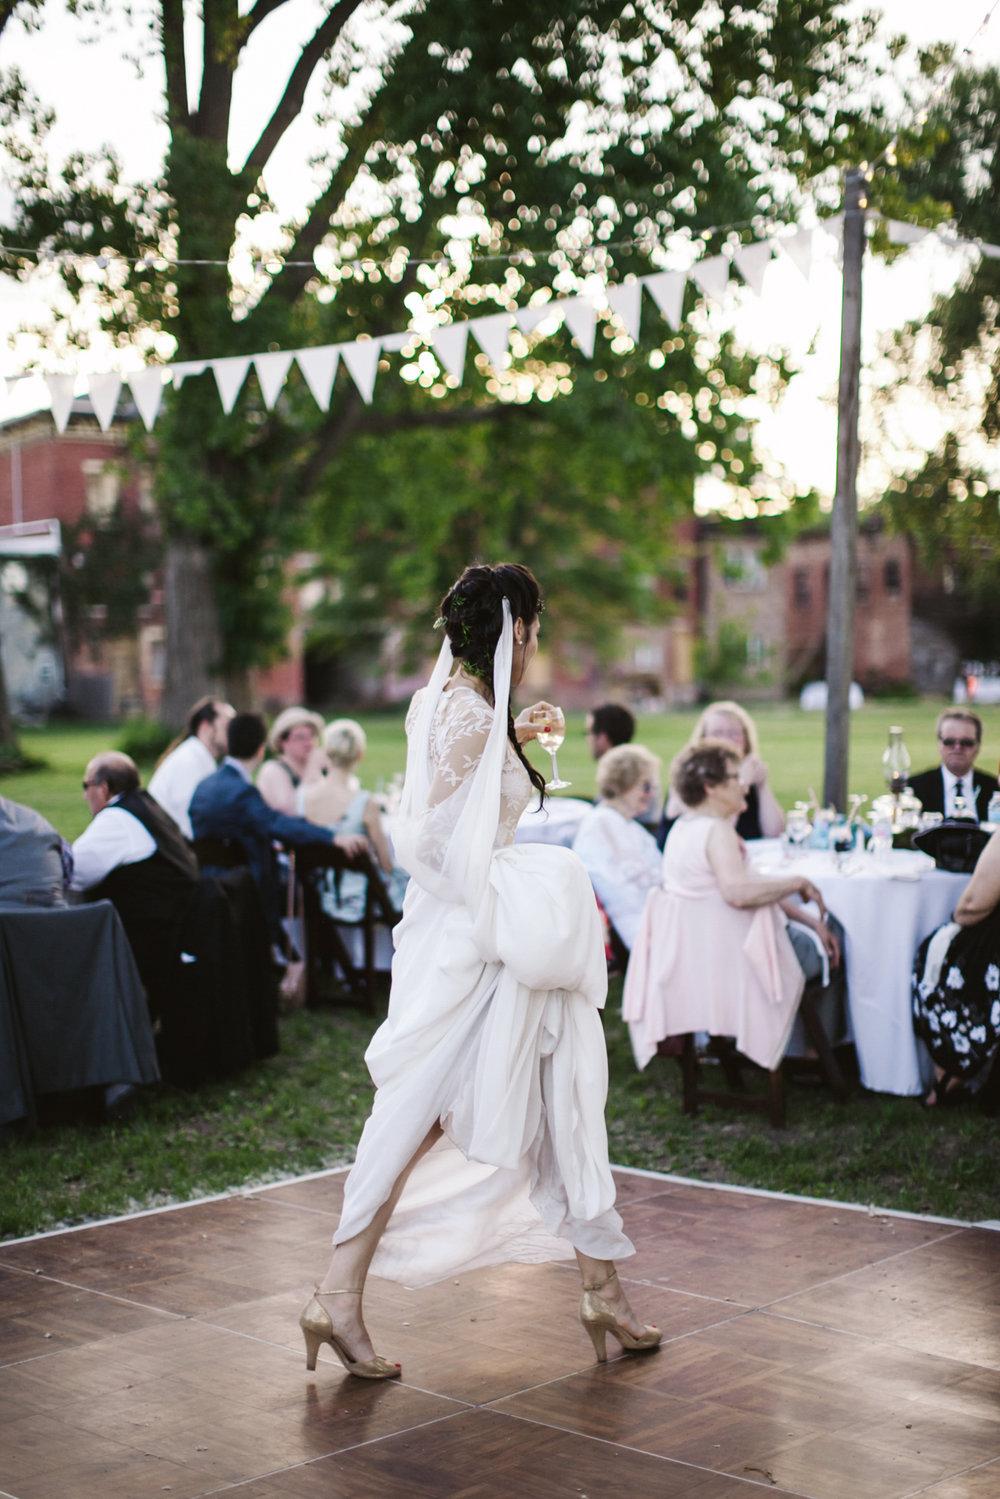 Kimberly-Coccagnia-Wedding-Photographer-248.JPG